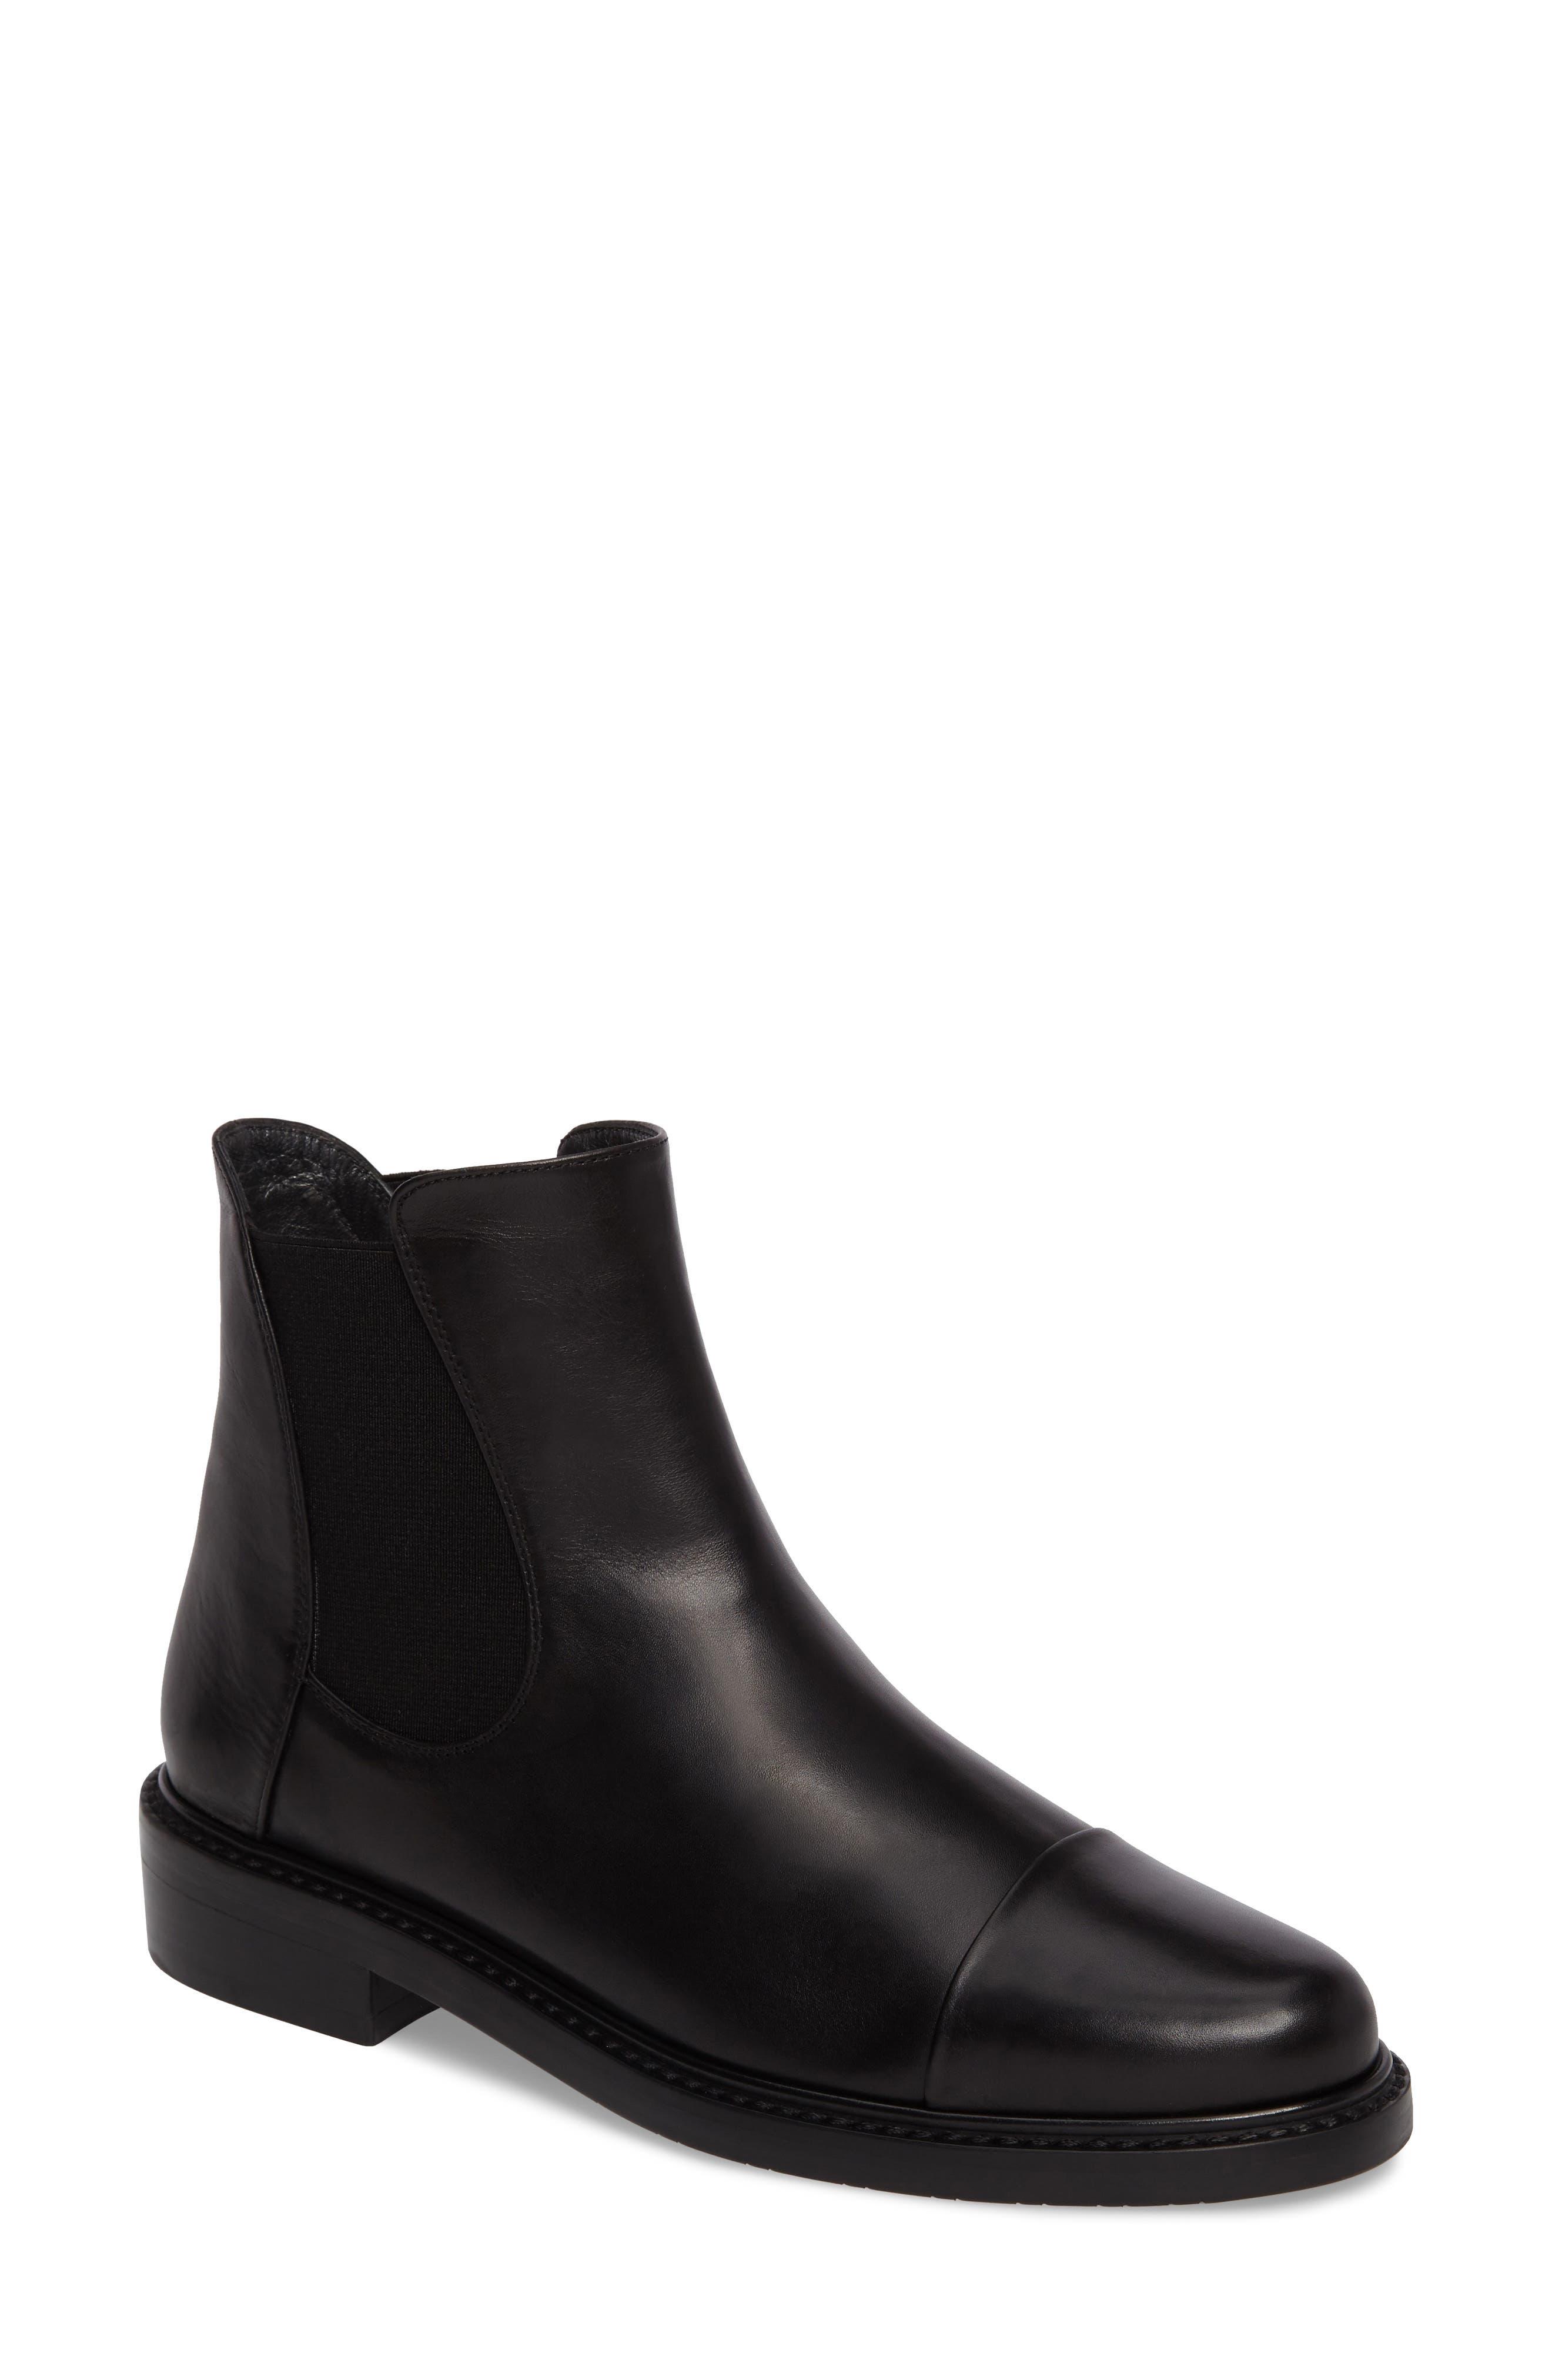 Gobi Cap Toe Chelsea Boot,                             Main thumbnail 1, color,                             Black Calf